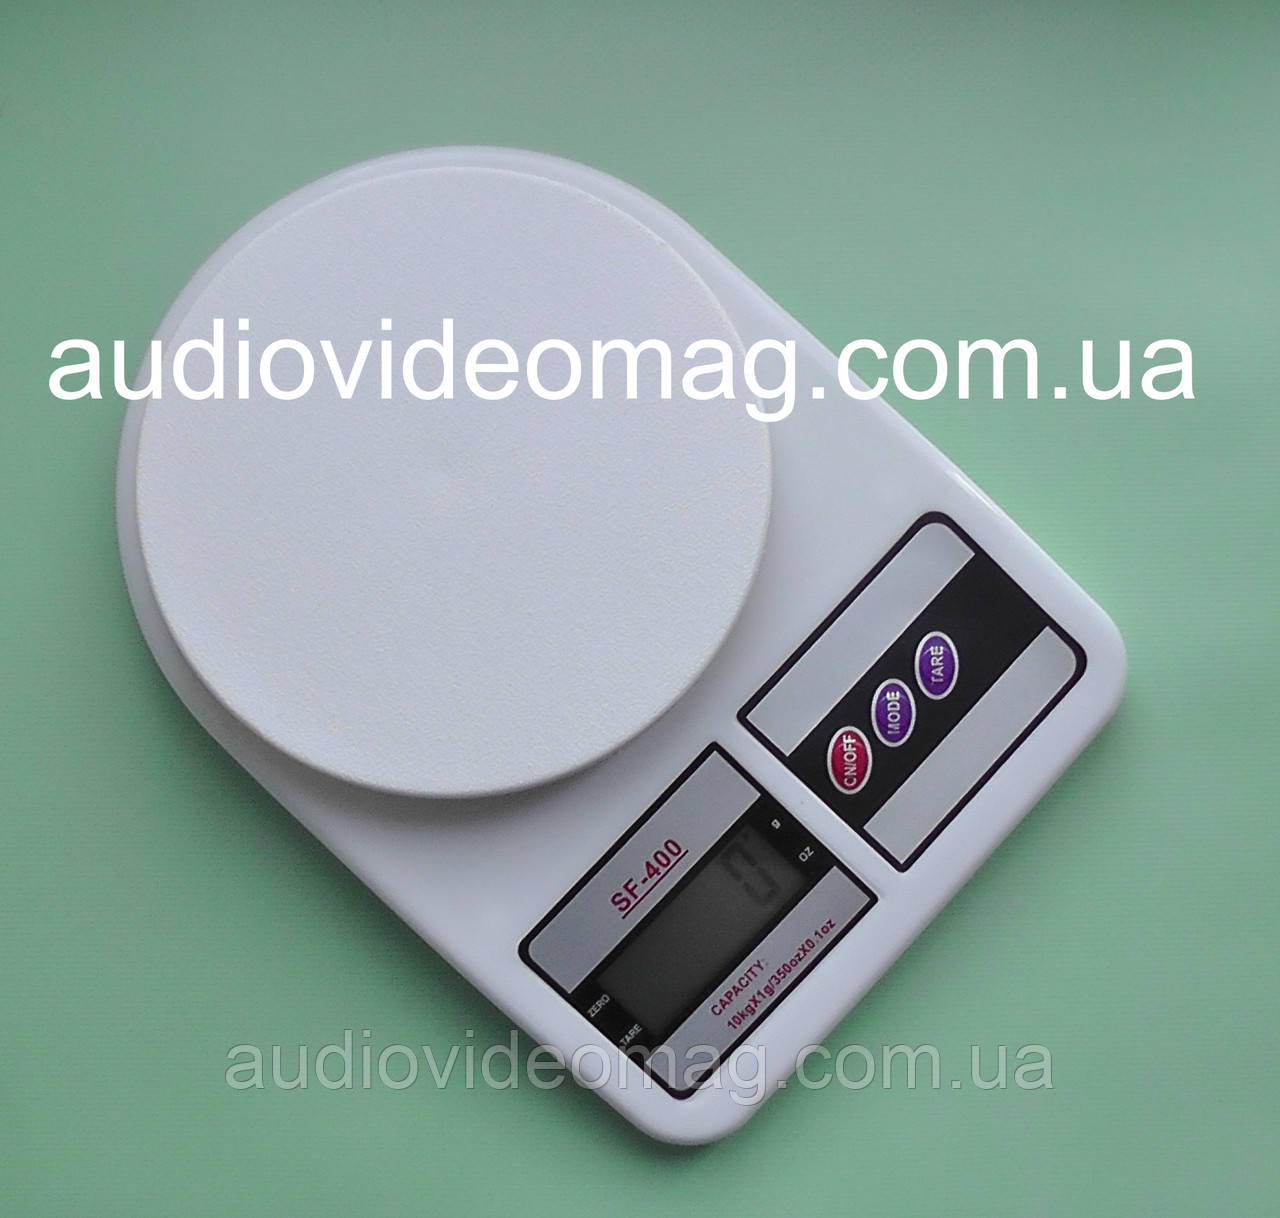 Весы кухонные электронные, до 7 кг